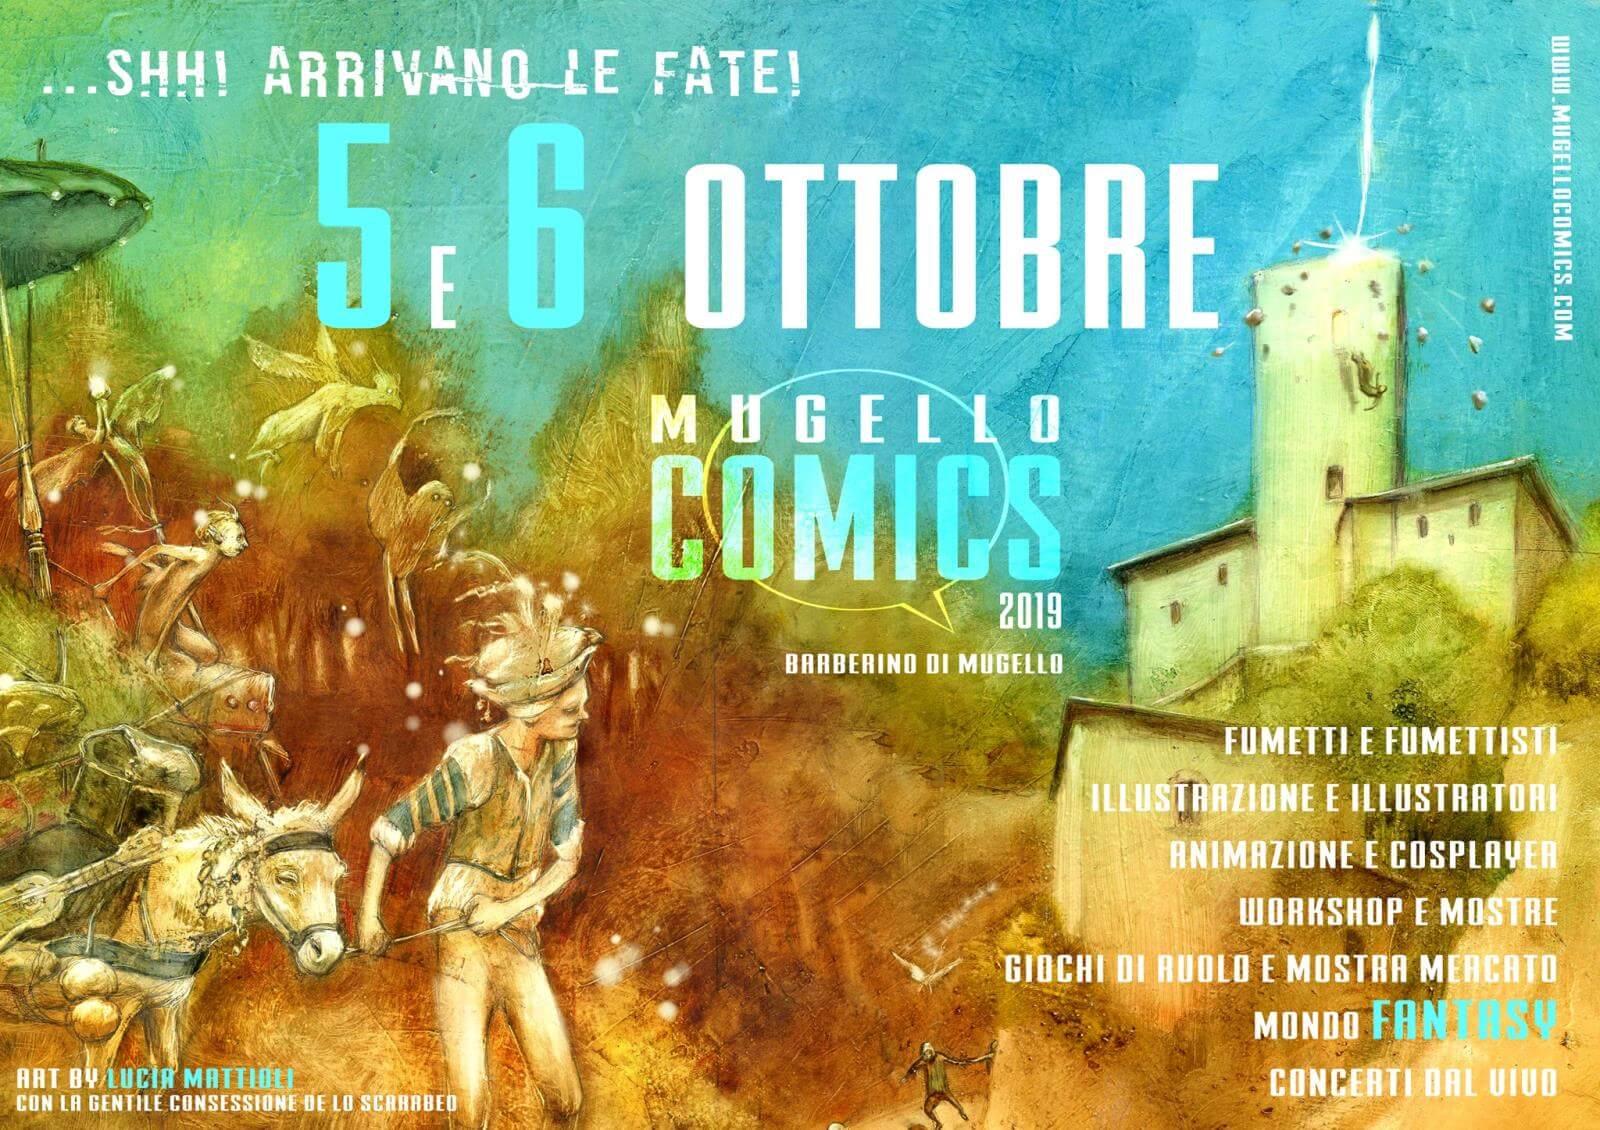 Mugello comics 2019 – Arrivano le Fate